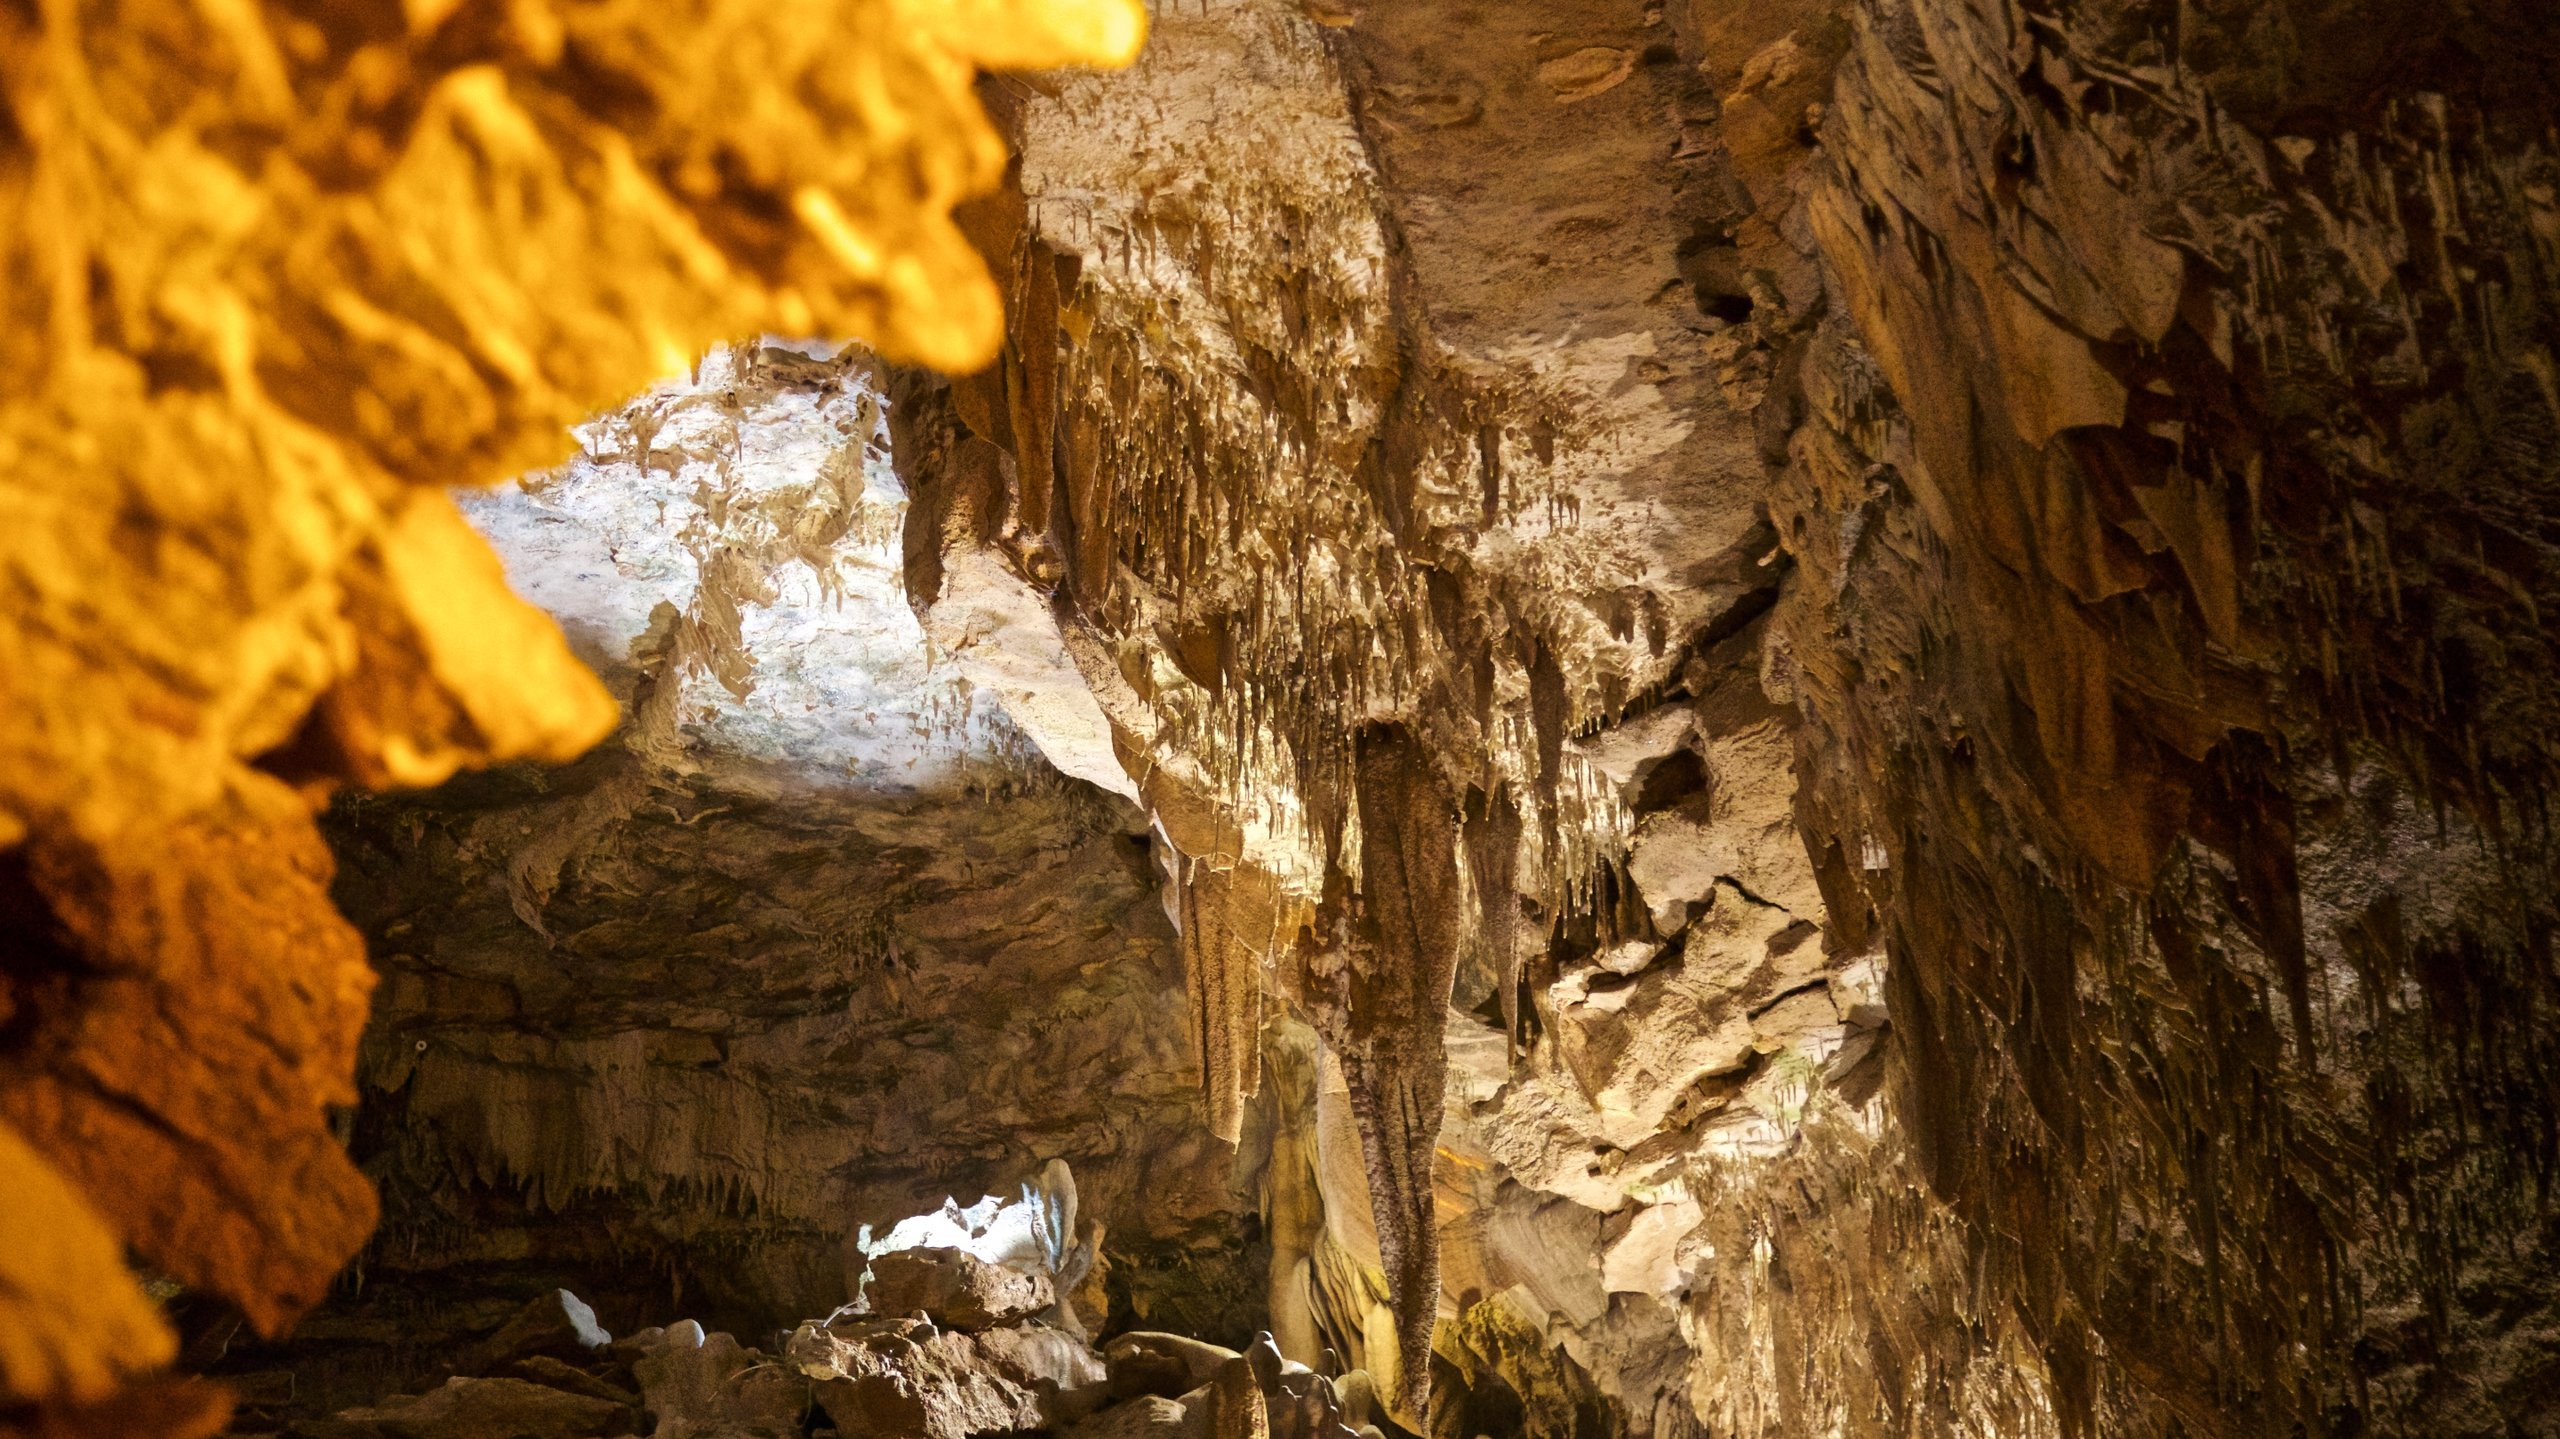 Fantastic Caverns, Springfield, Missouri, United States of America